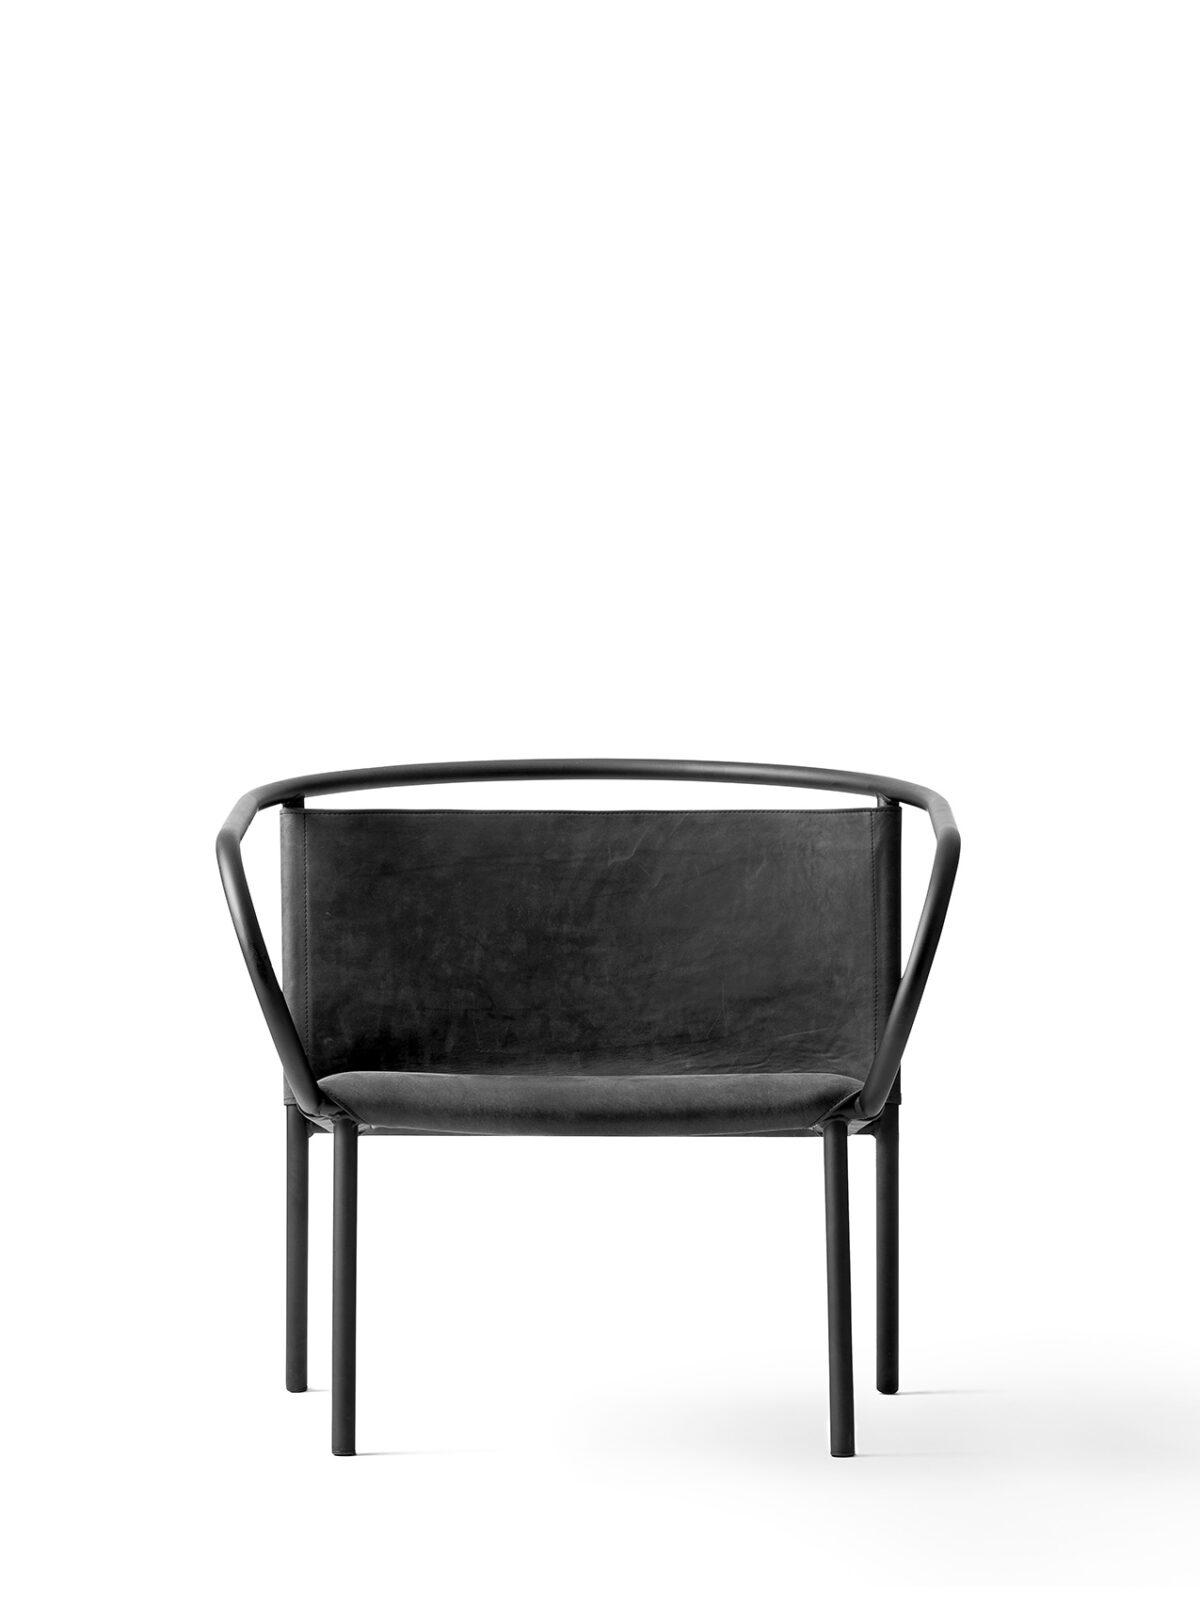 8860539 Afteroom Lounge Chair Afteroom Black 01 2